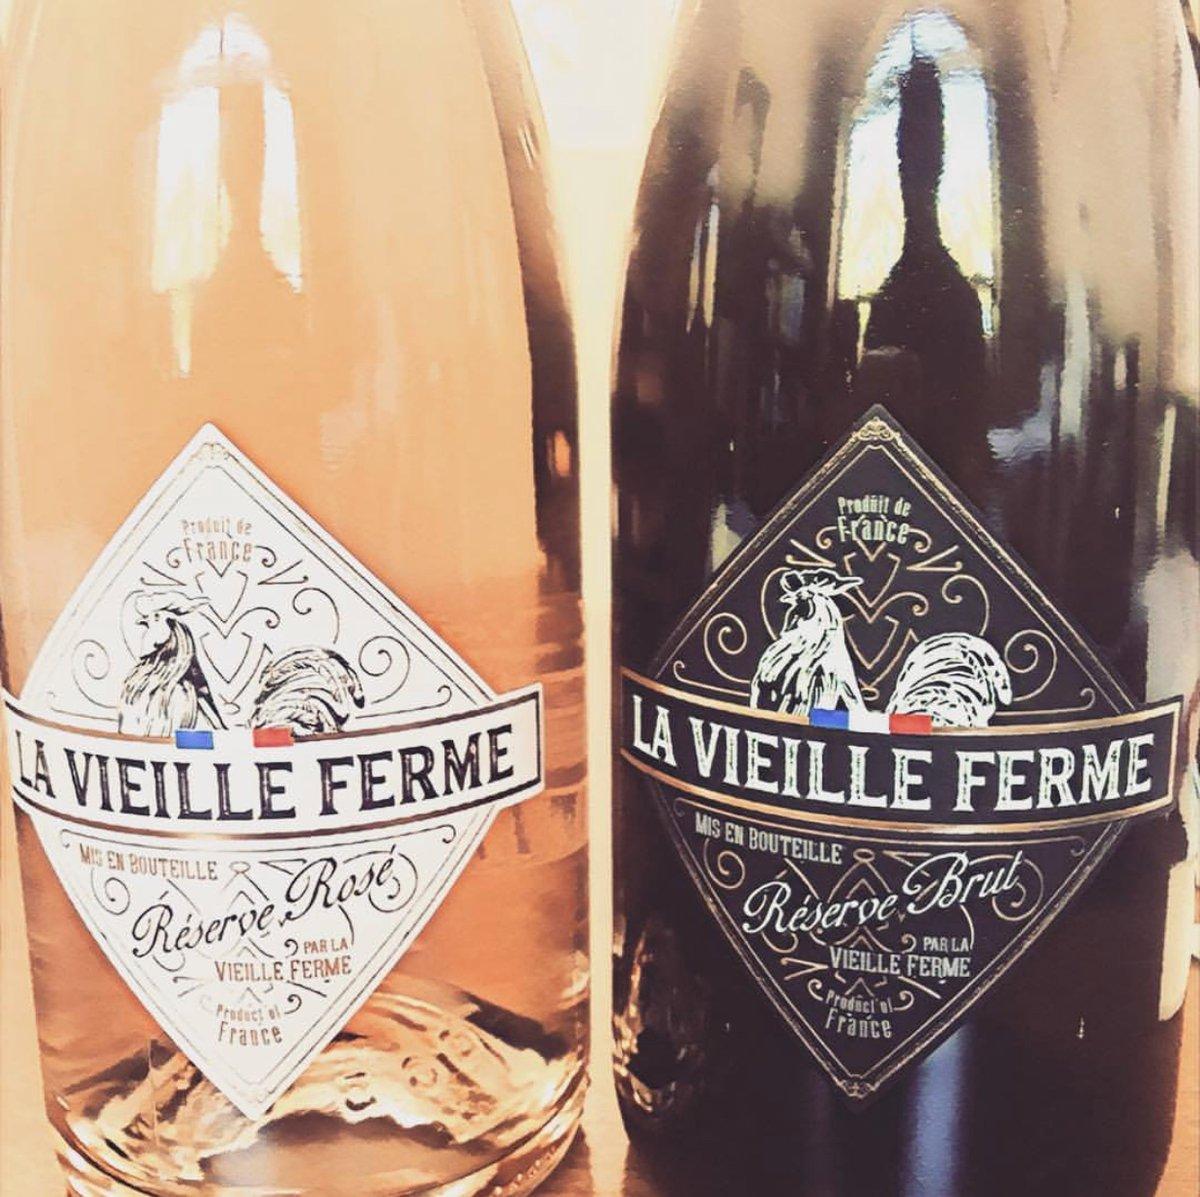 Vineyard Brands Has Announced the Launch of La Vieille Ferme Sparklers